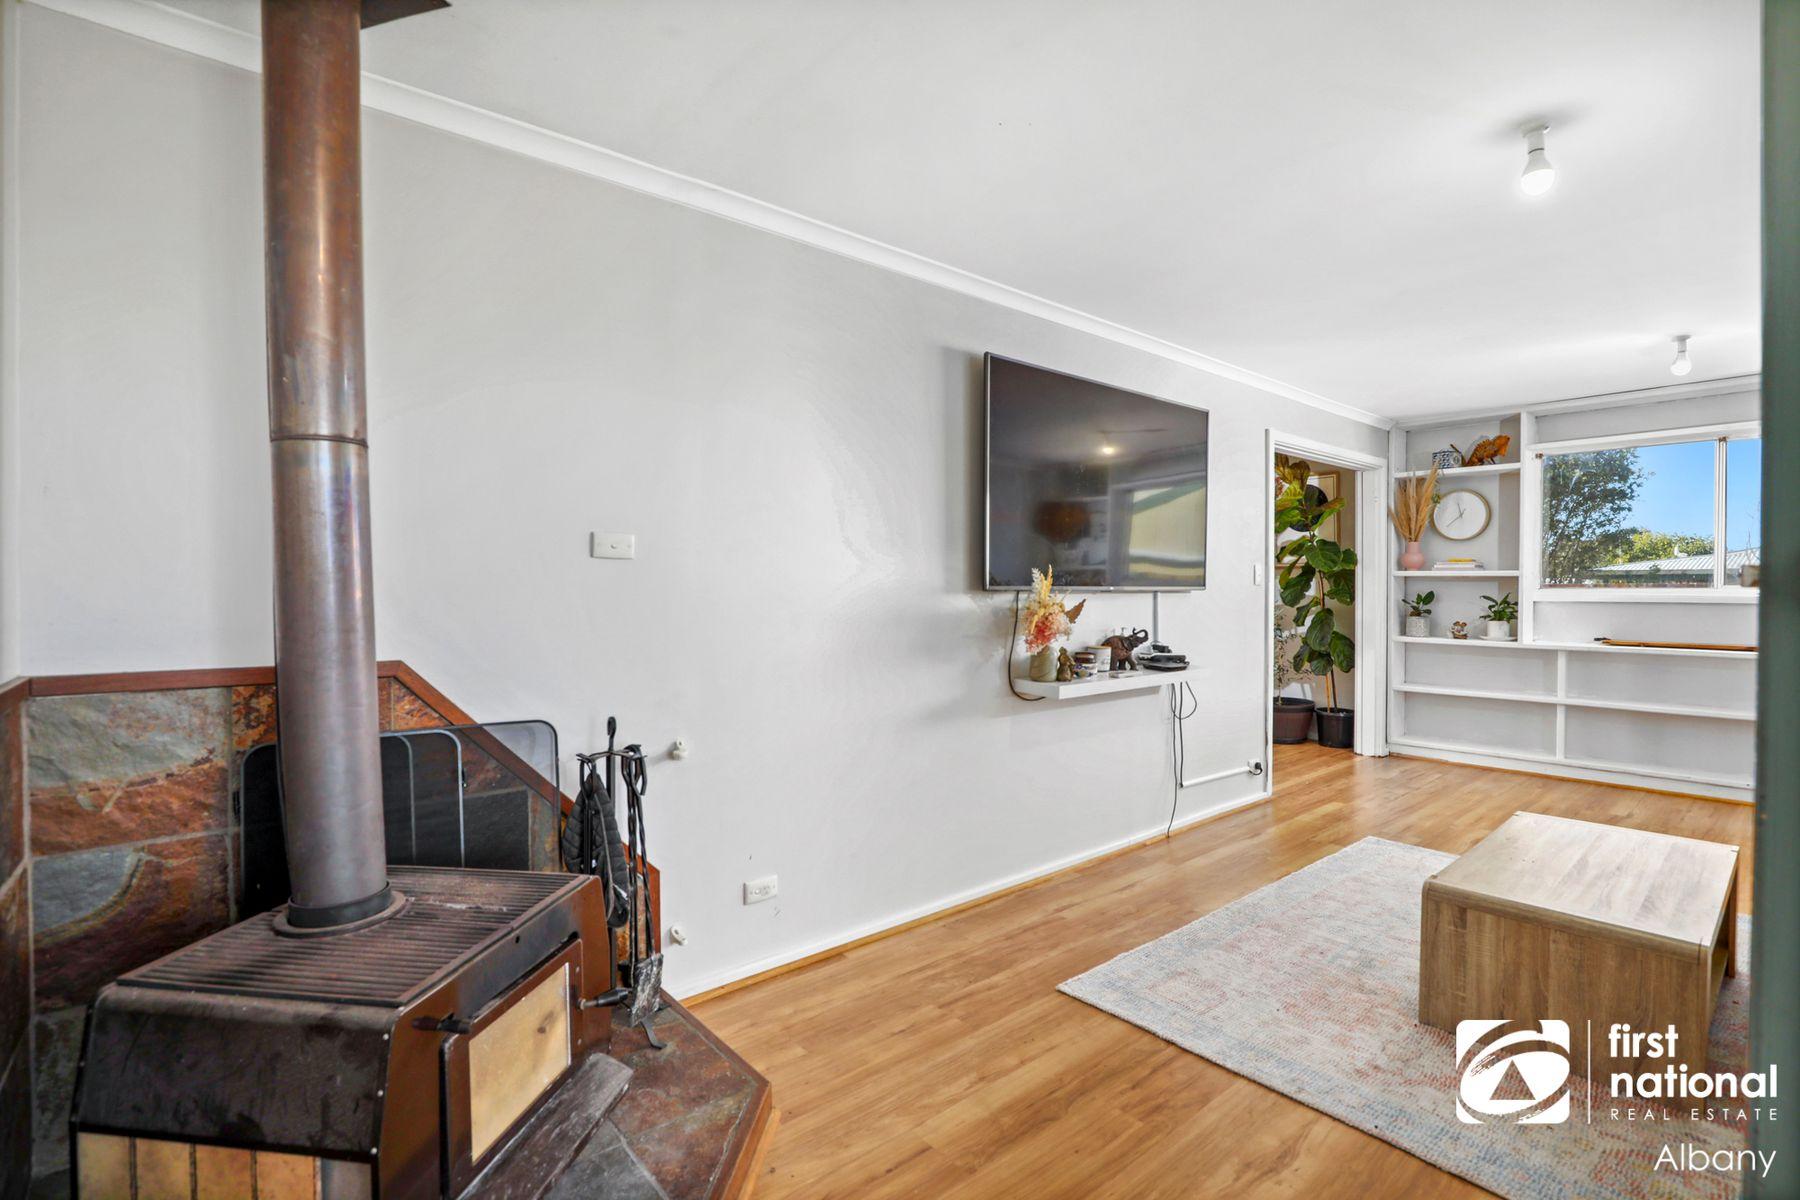 46 Edinburgh Rd, McKail, WA 6330